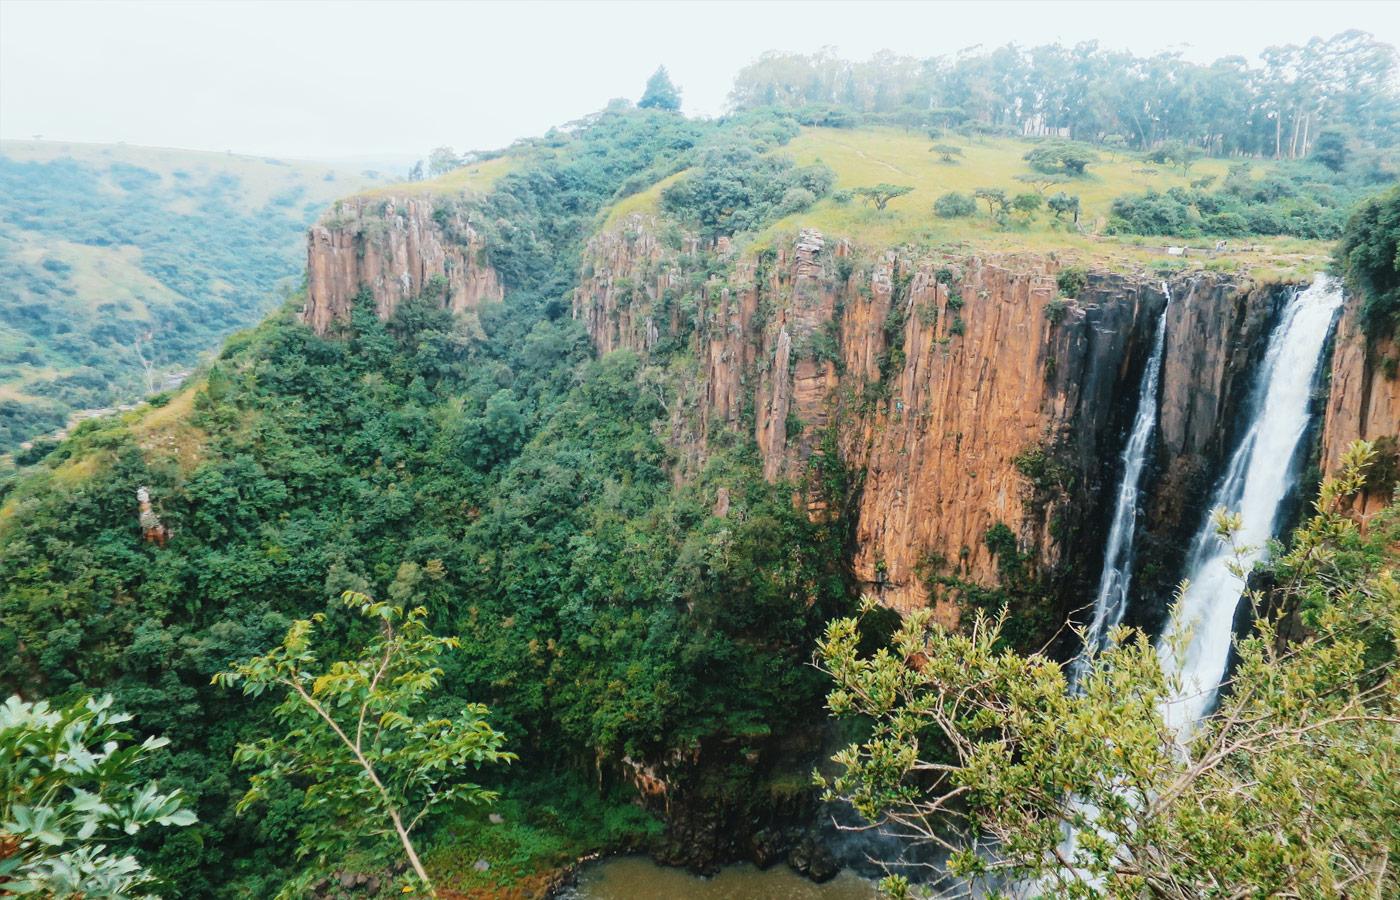 04_waterfall_aug18.jpg